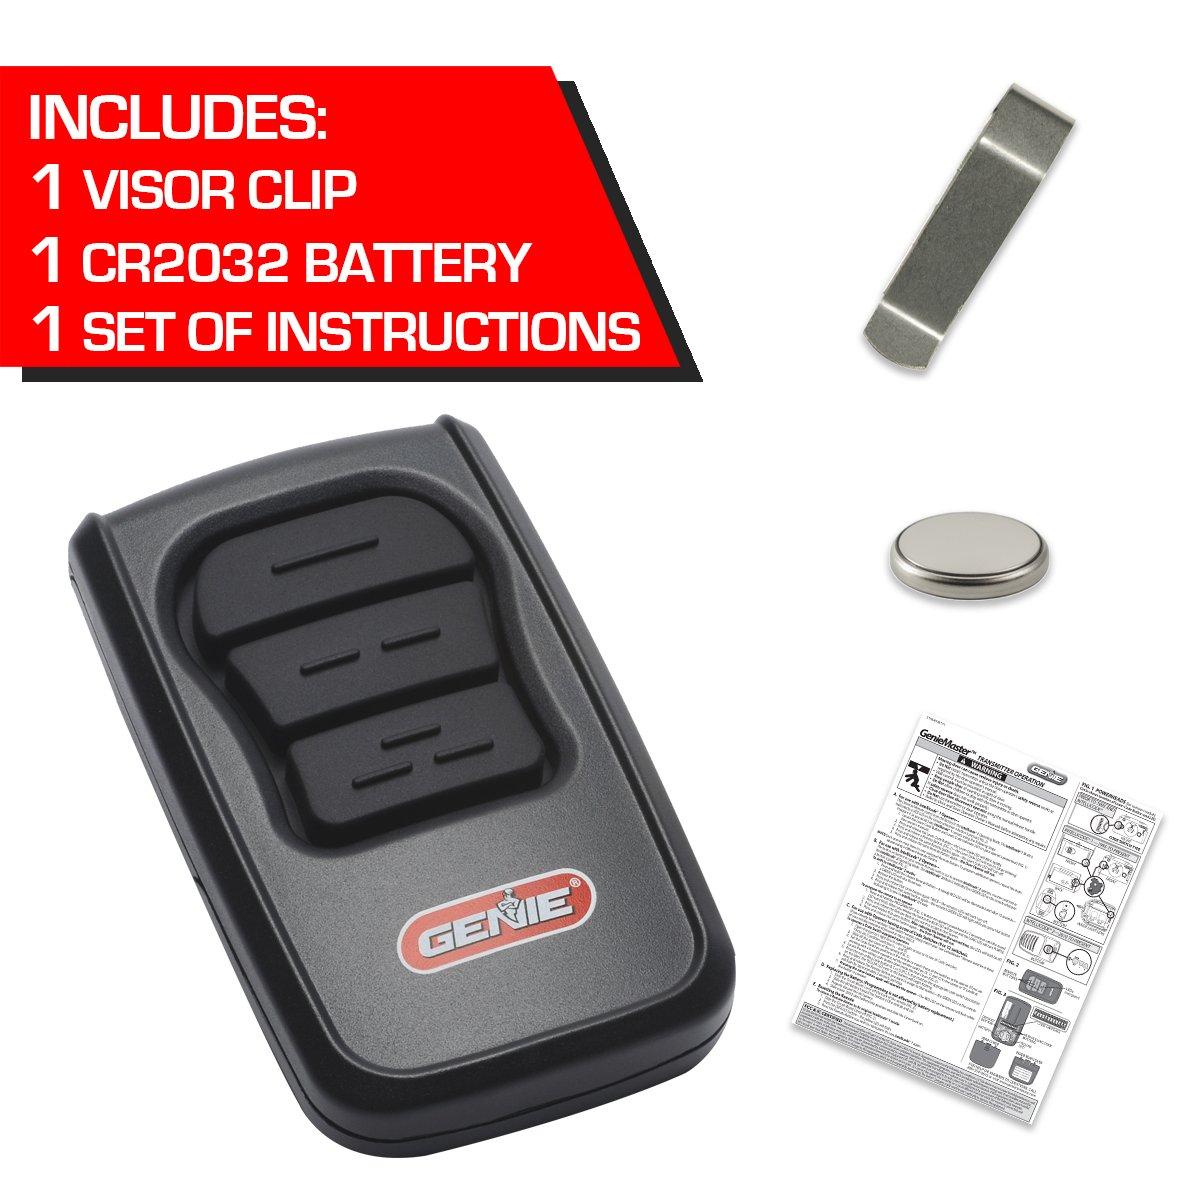 genie master 3 button remote for controlling up to 3 genie garage rh amazon com Genie GT912 Remote Genie Cryptar II Remote Control